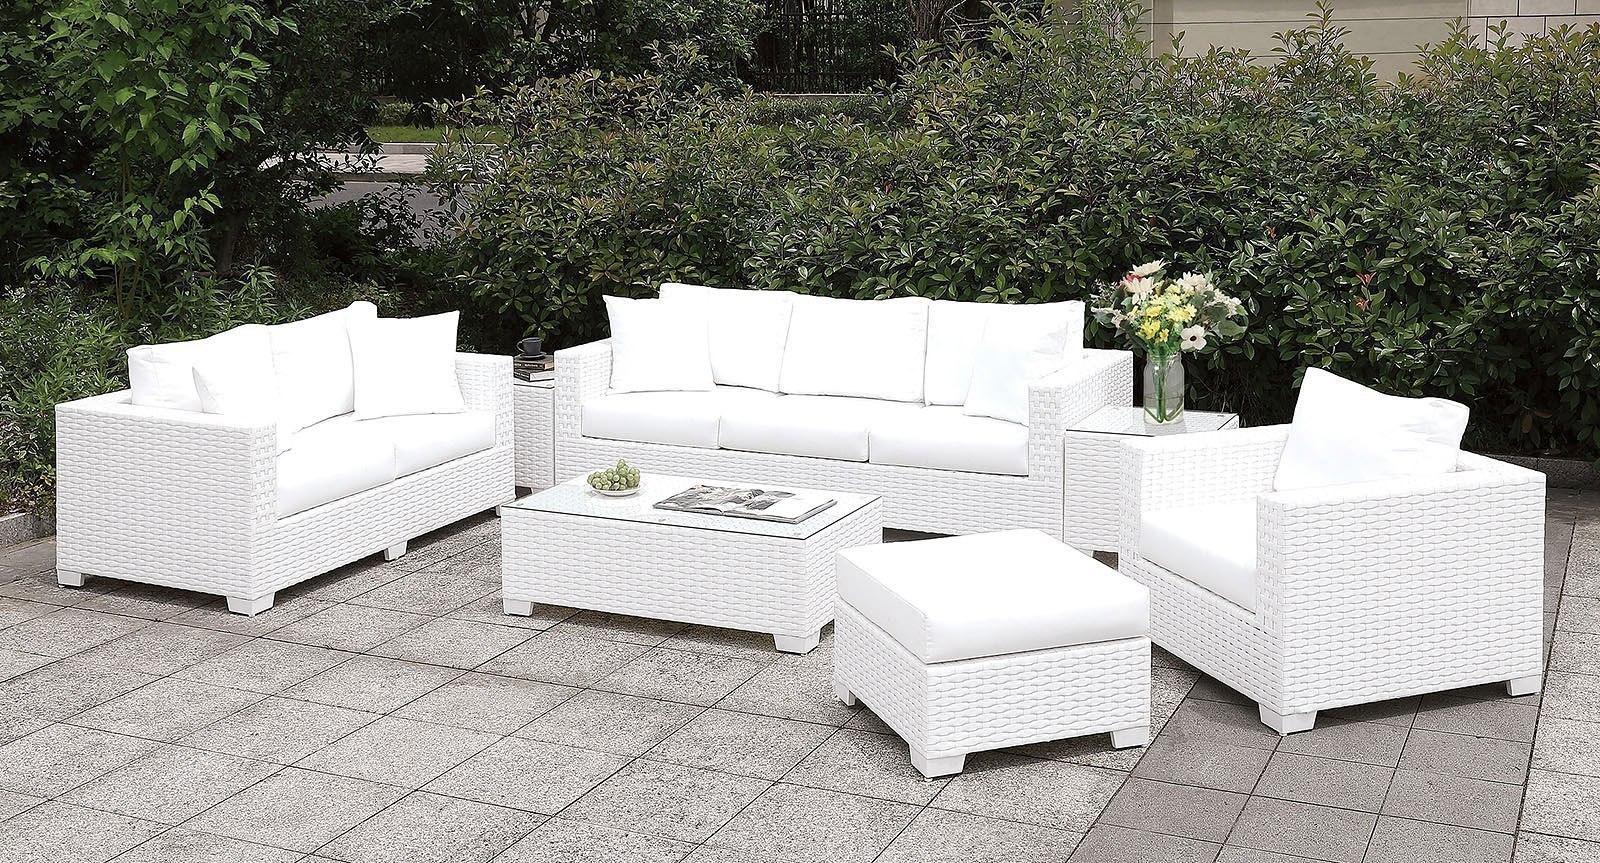 somani white outdoor seating set configuration 15